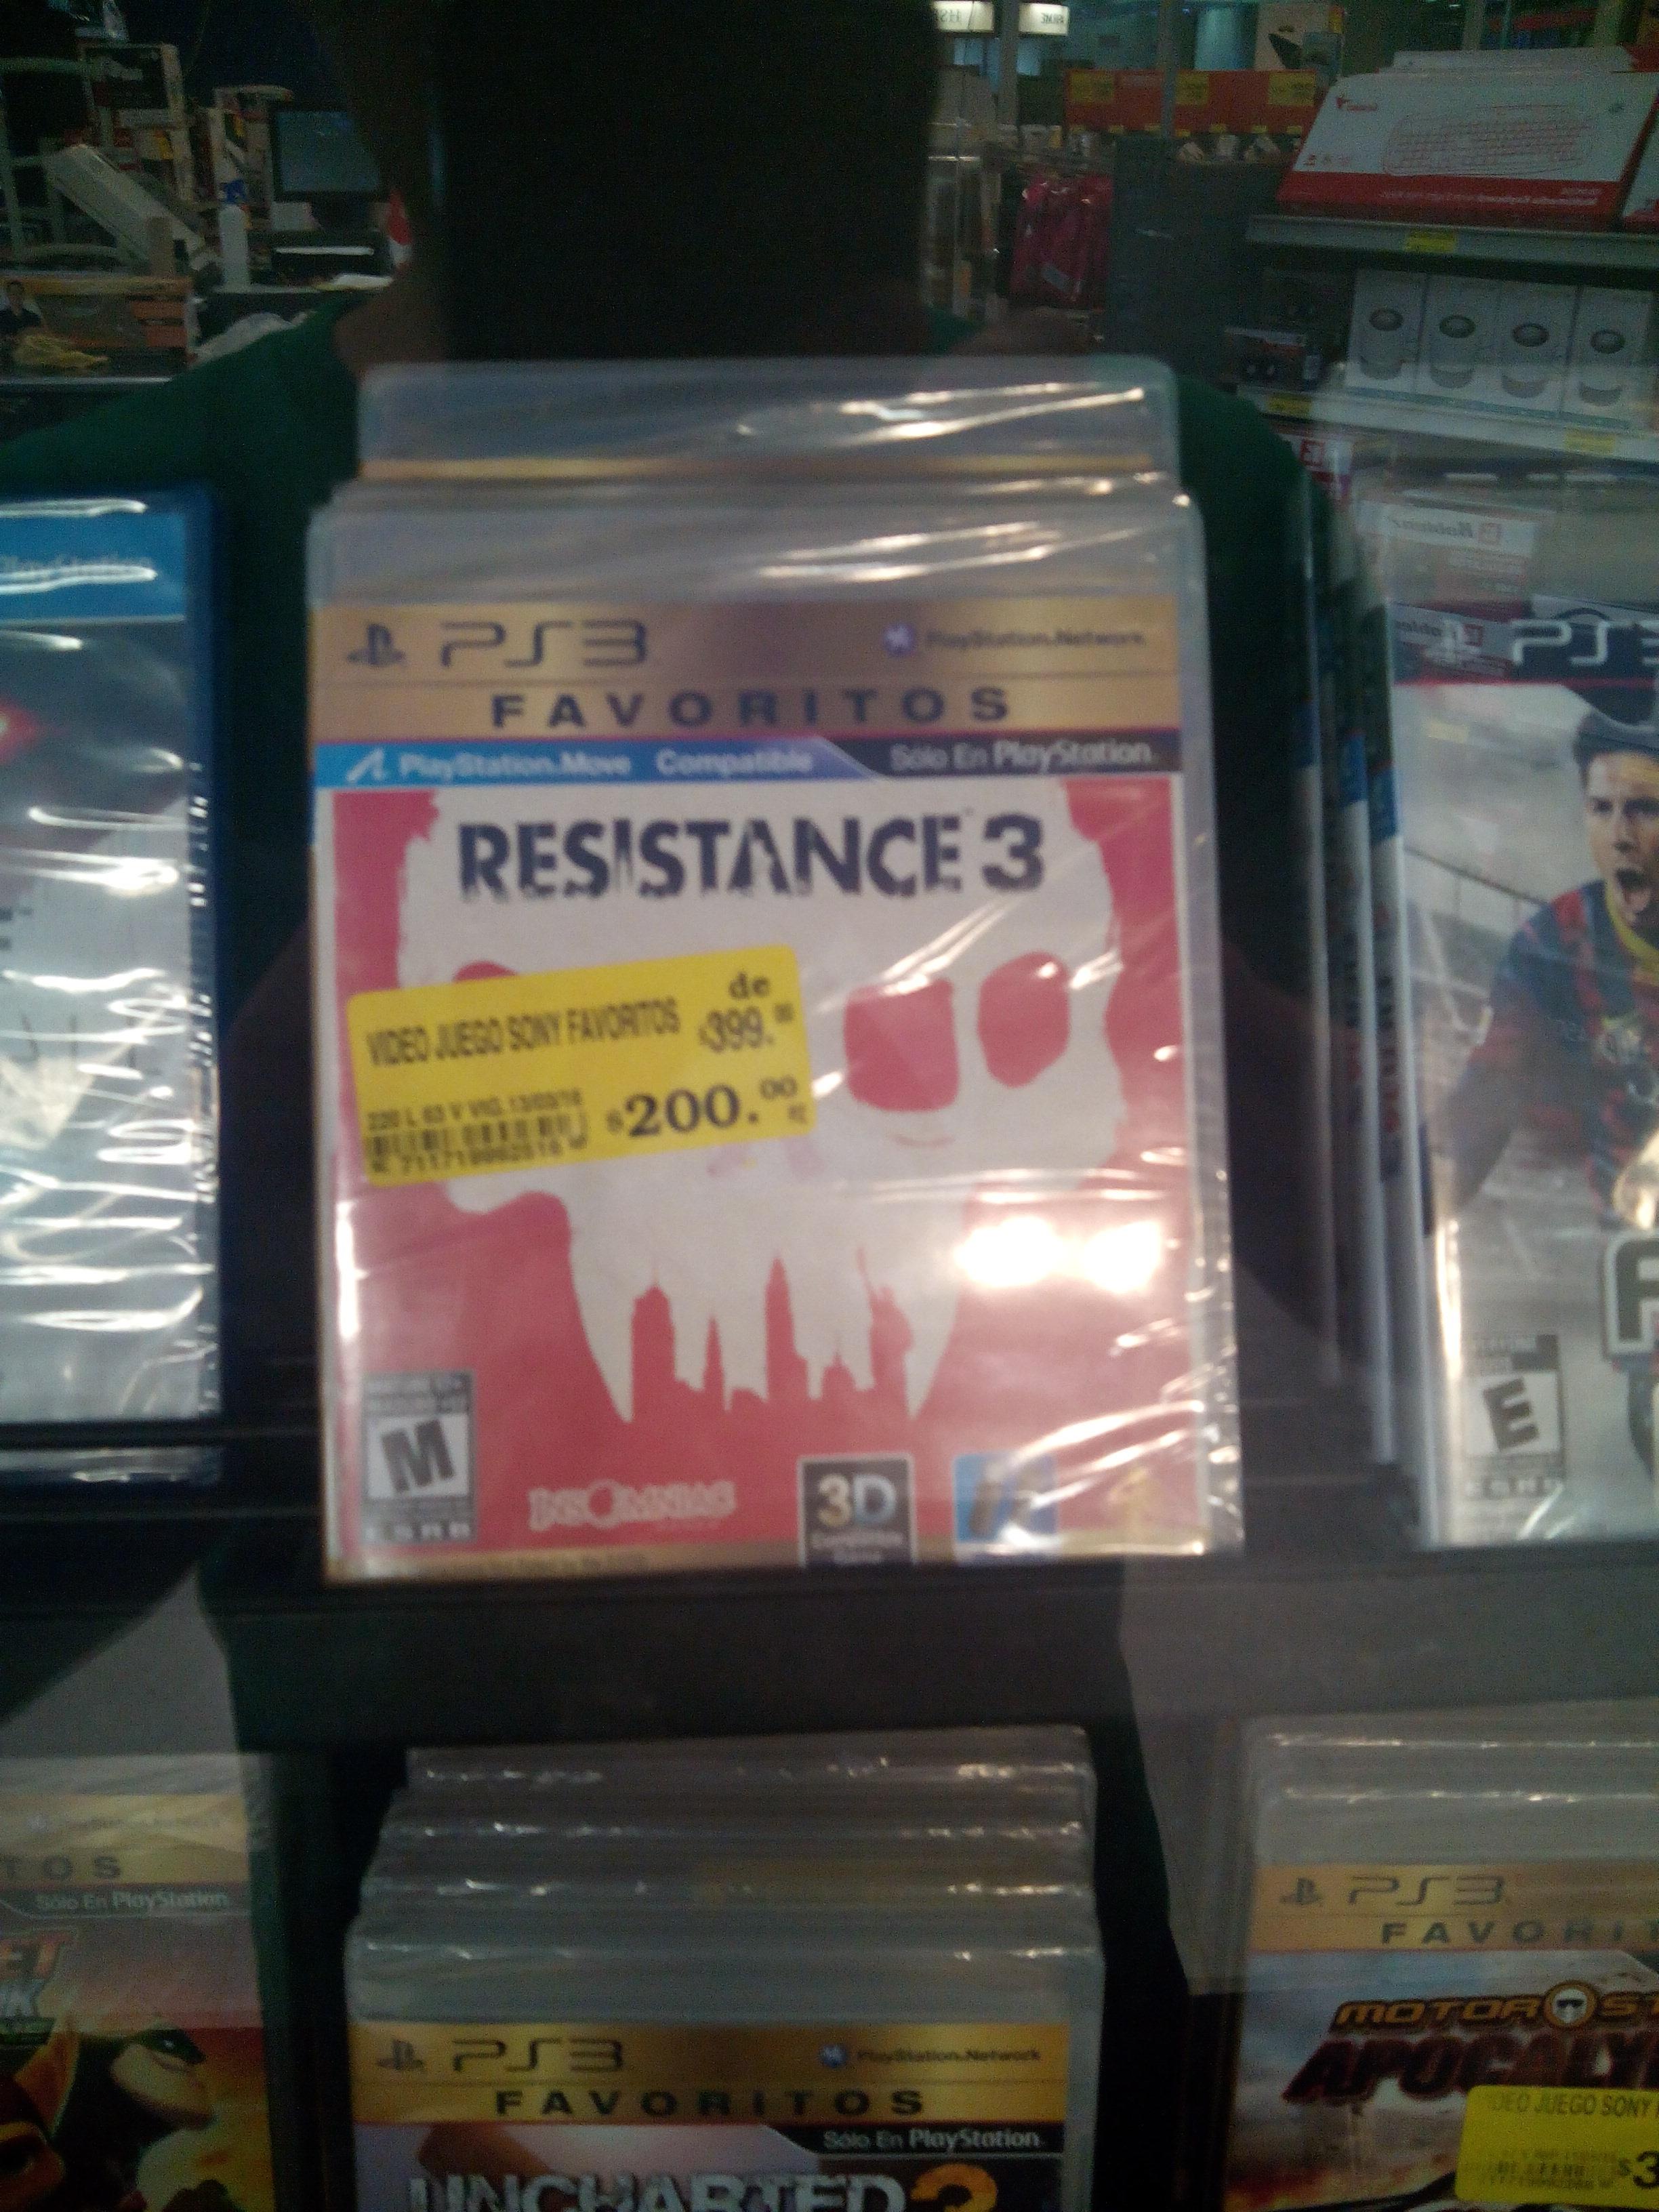 Soriana Sendero Querétaro: Resistance 3 Playstation 3 a $200